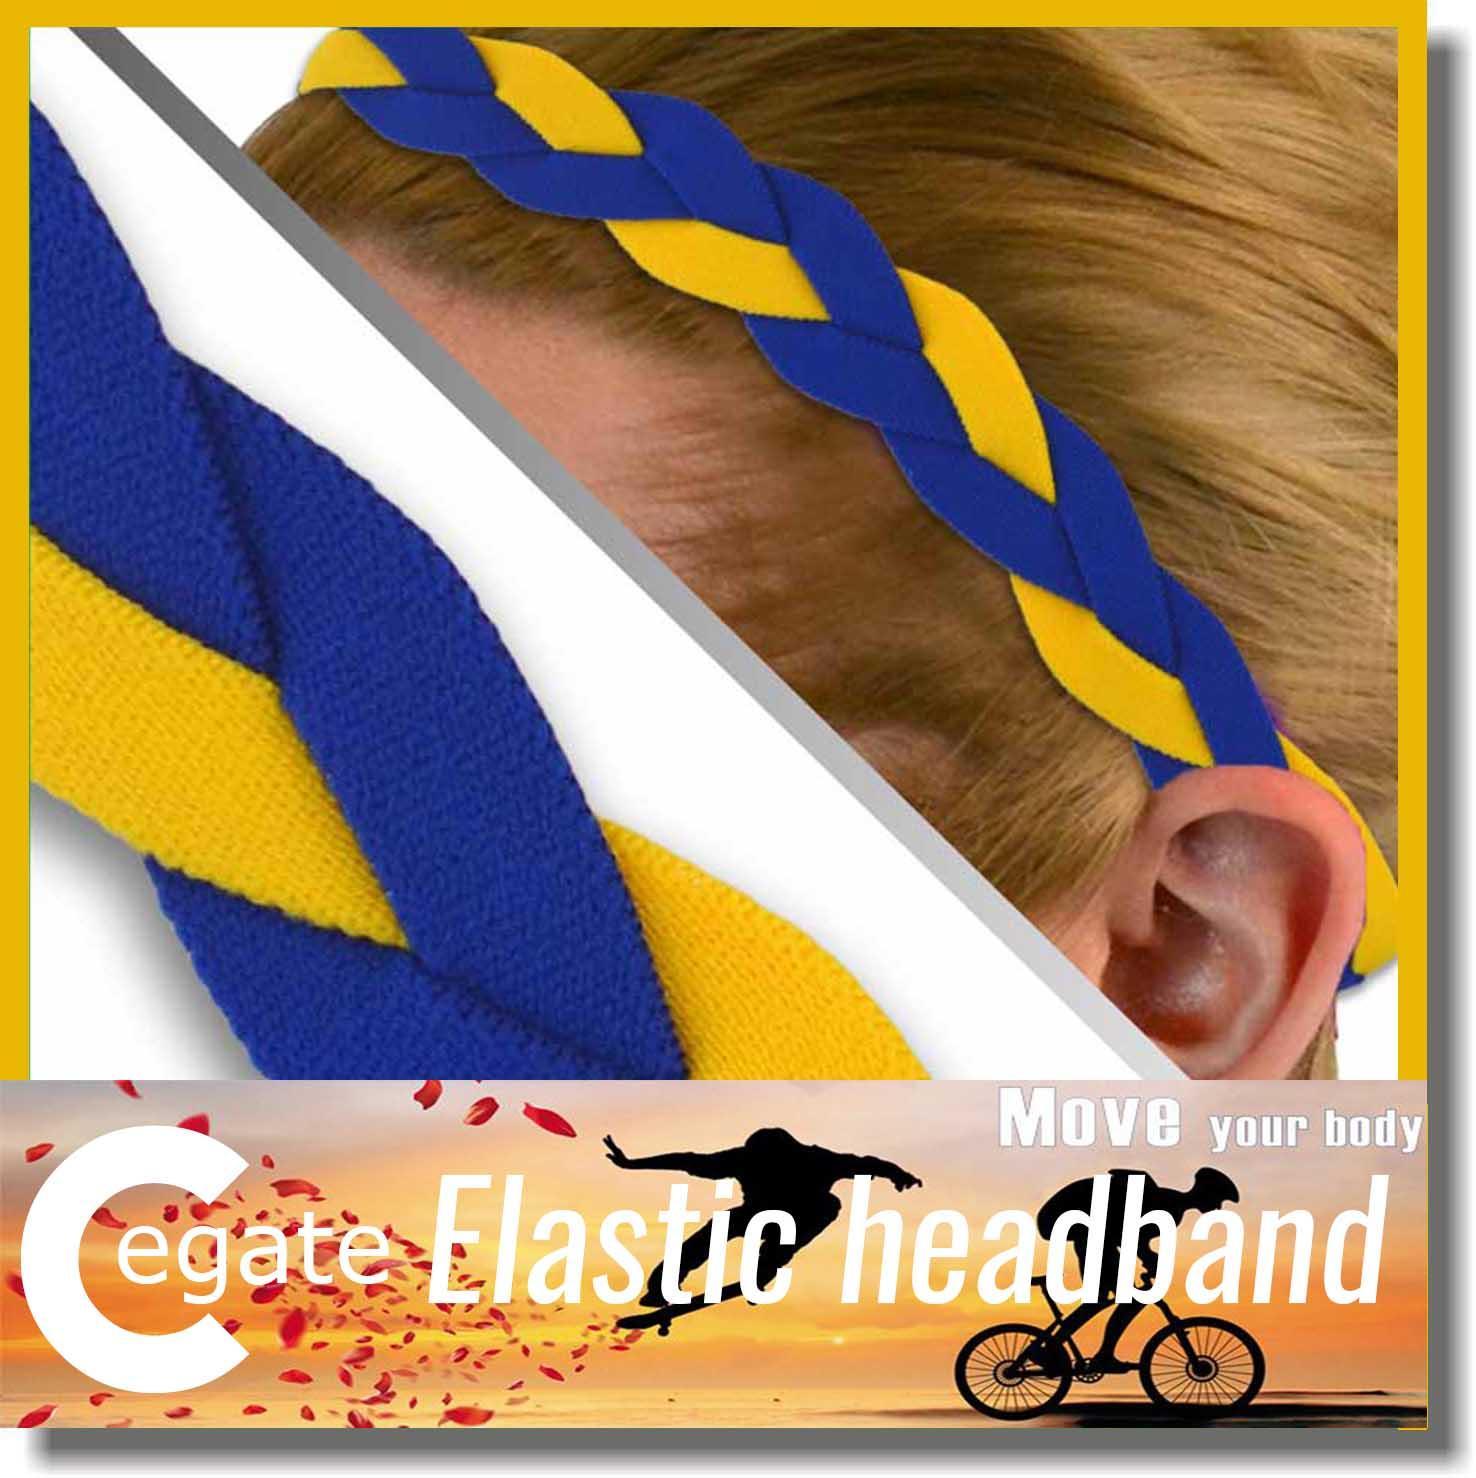 2016 Hot sale sport Headbands Elastic Soft Stretch Adult Youth Sports Workouts baseball Fashion braided mini headband free DHL